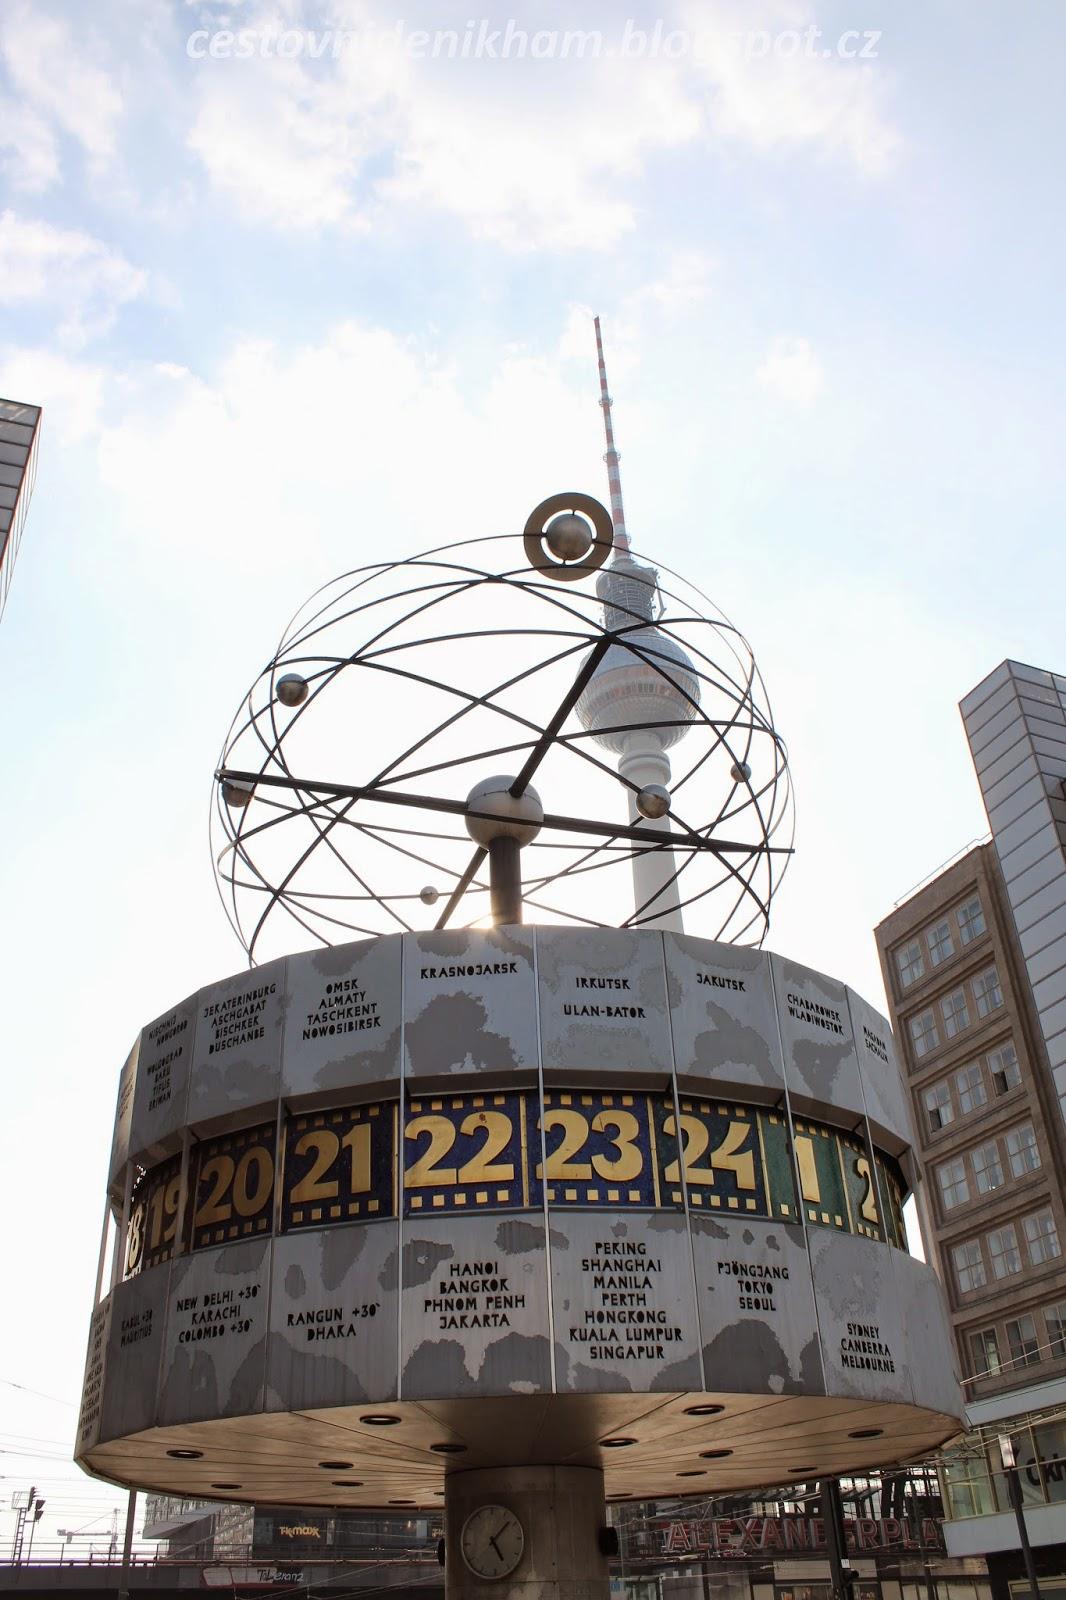 Hodiny světa // World clock